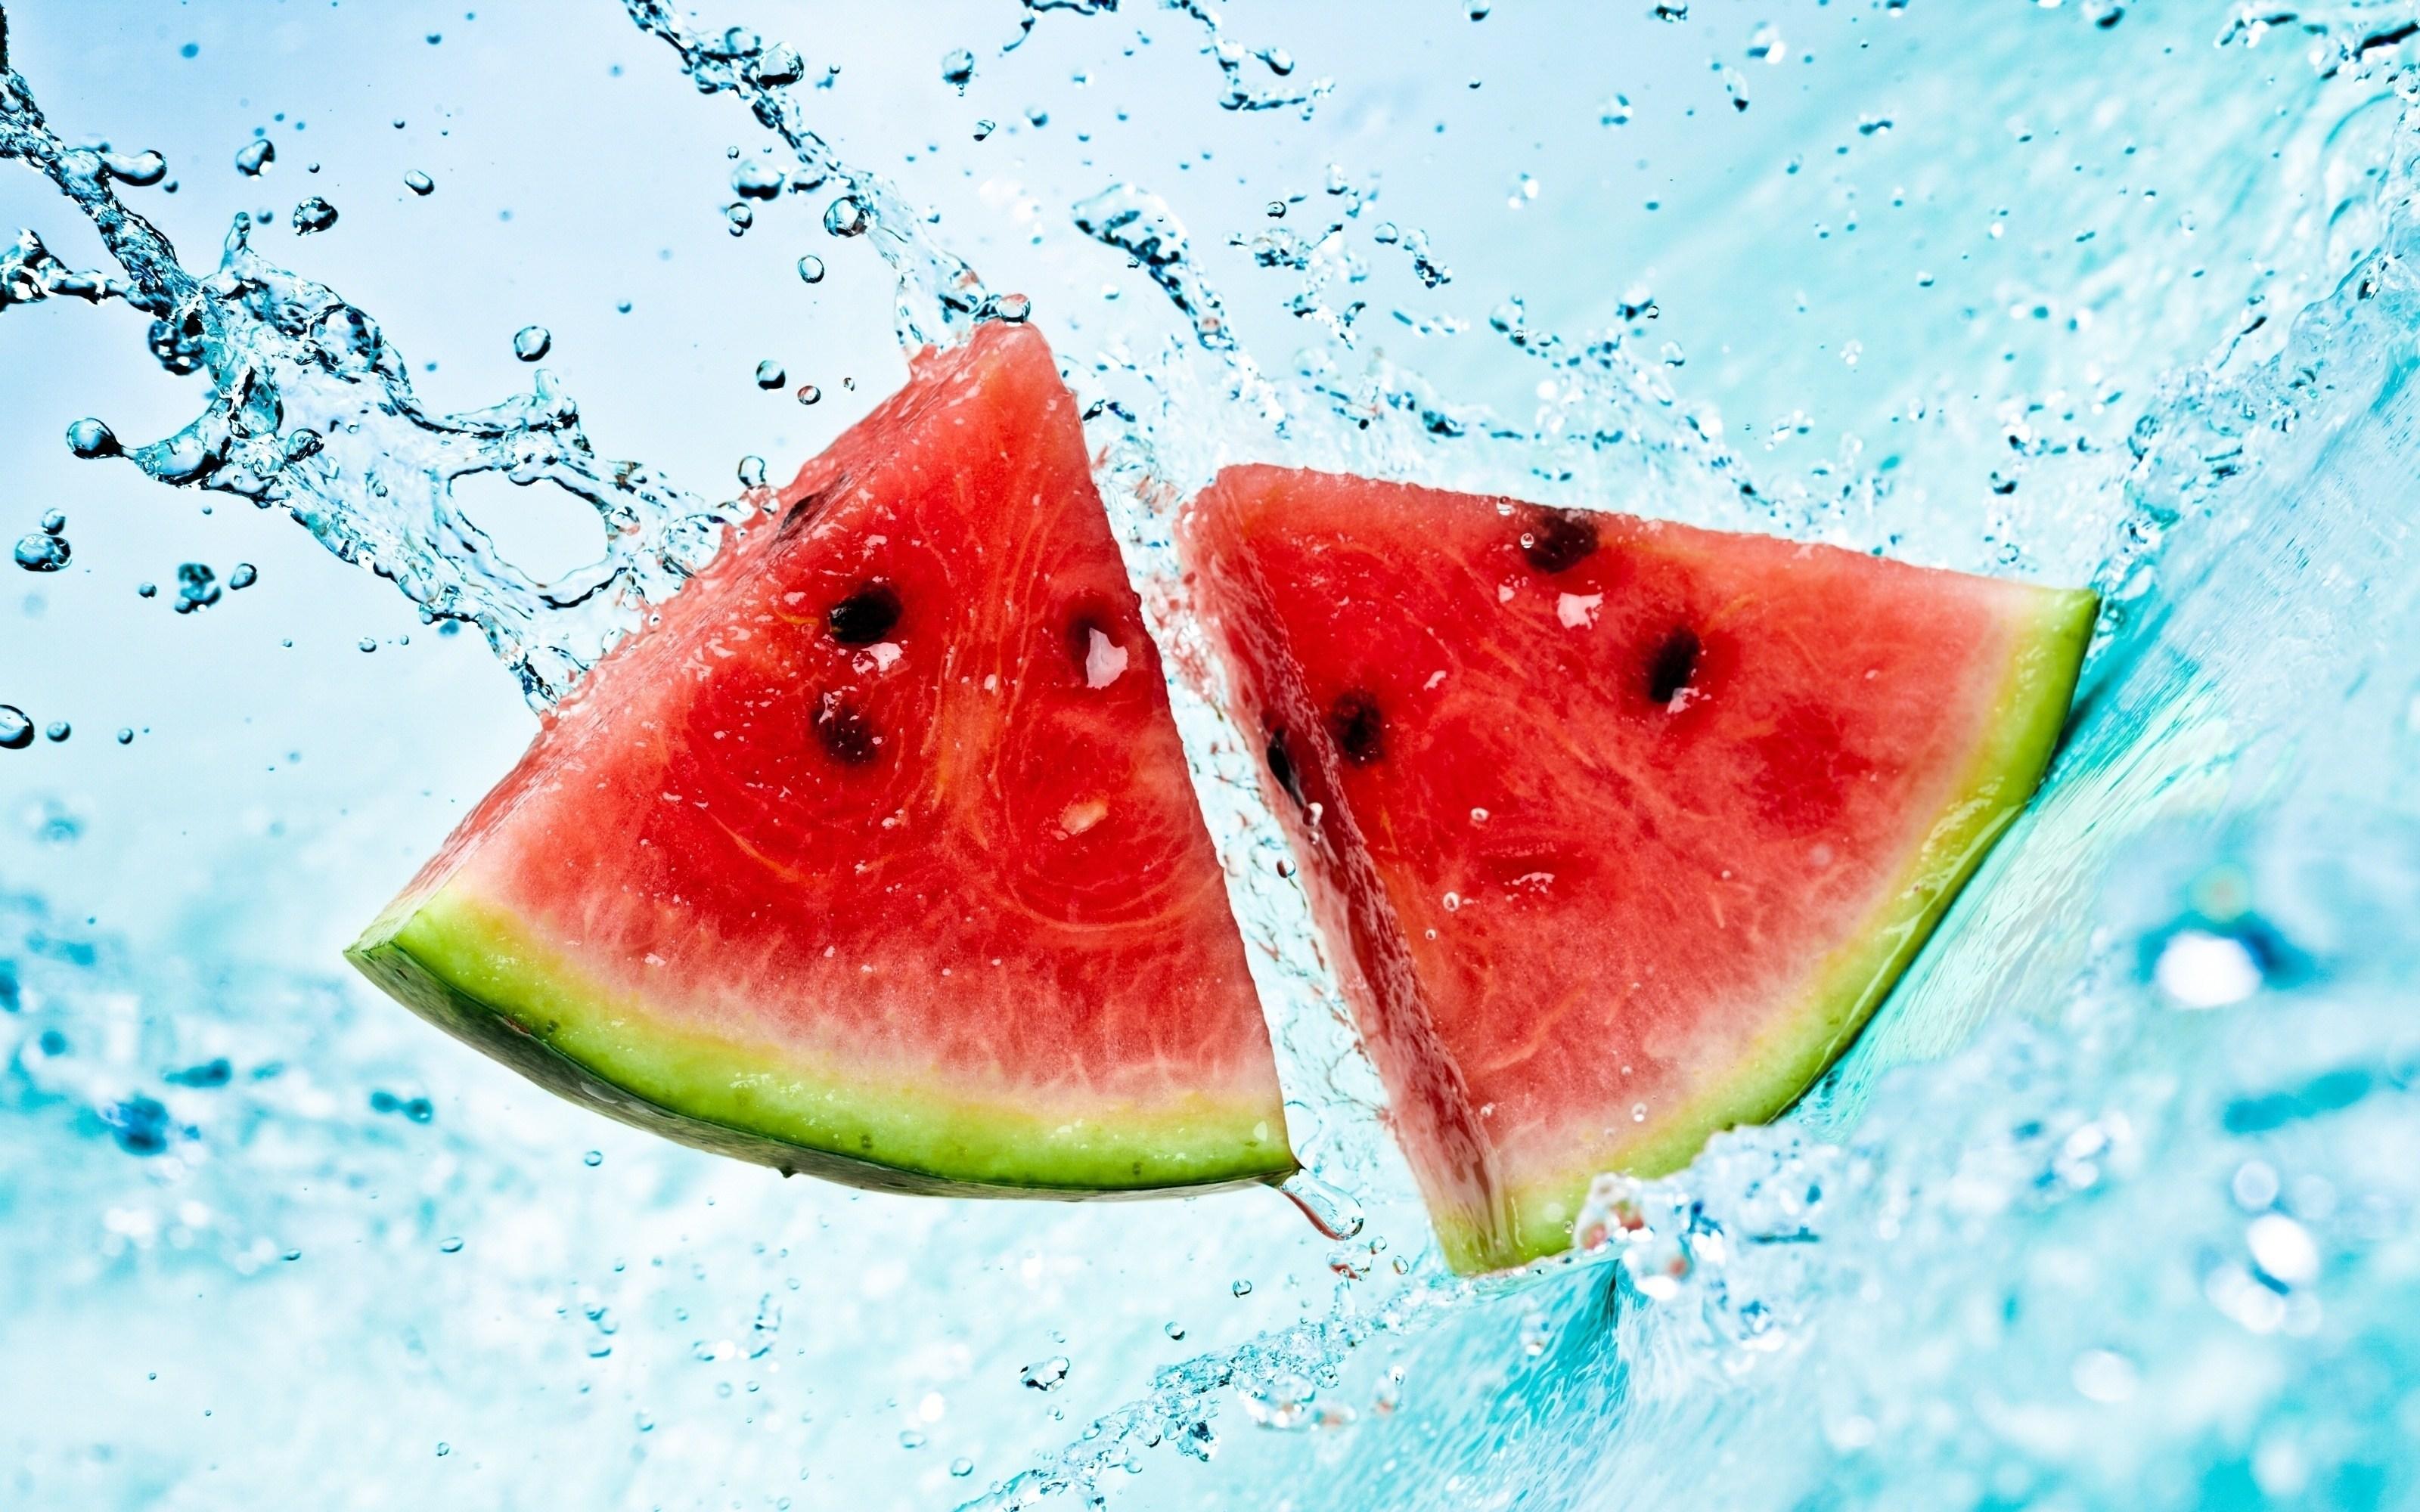 Watermelon-HD-Wallpapers